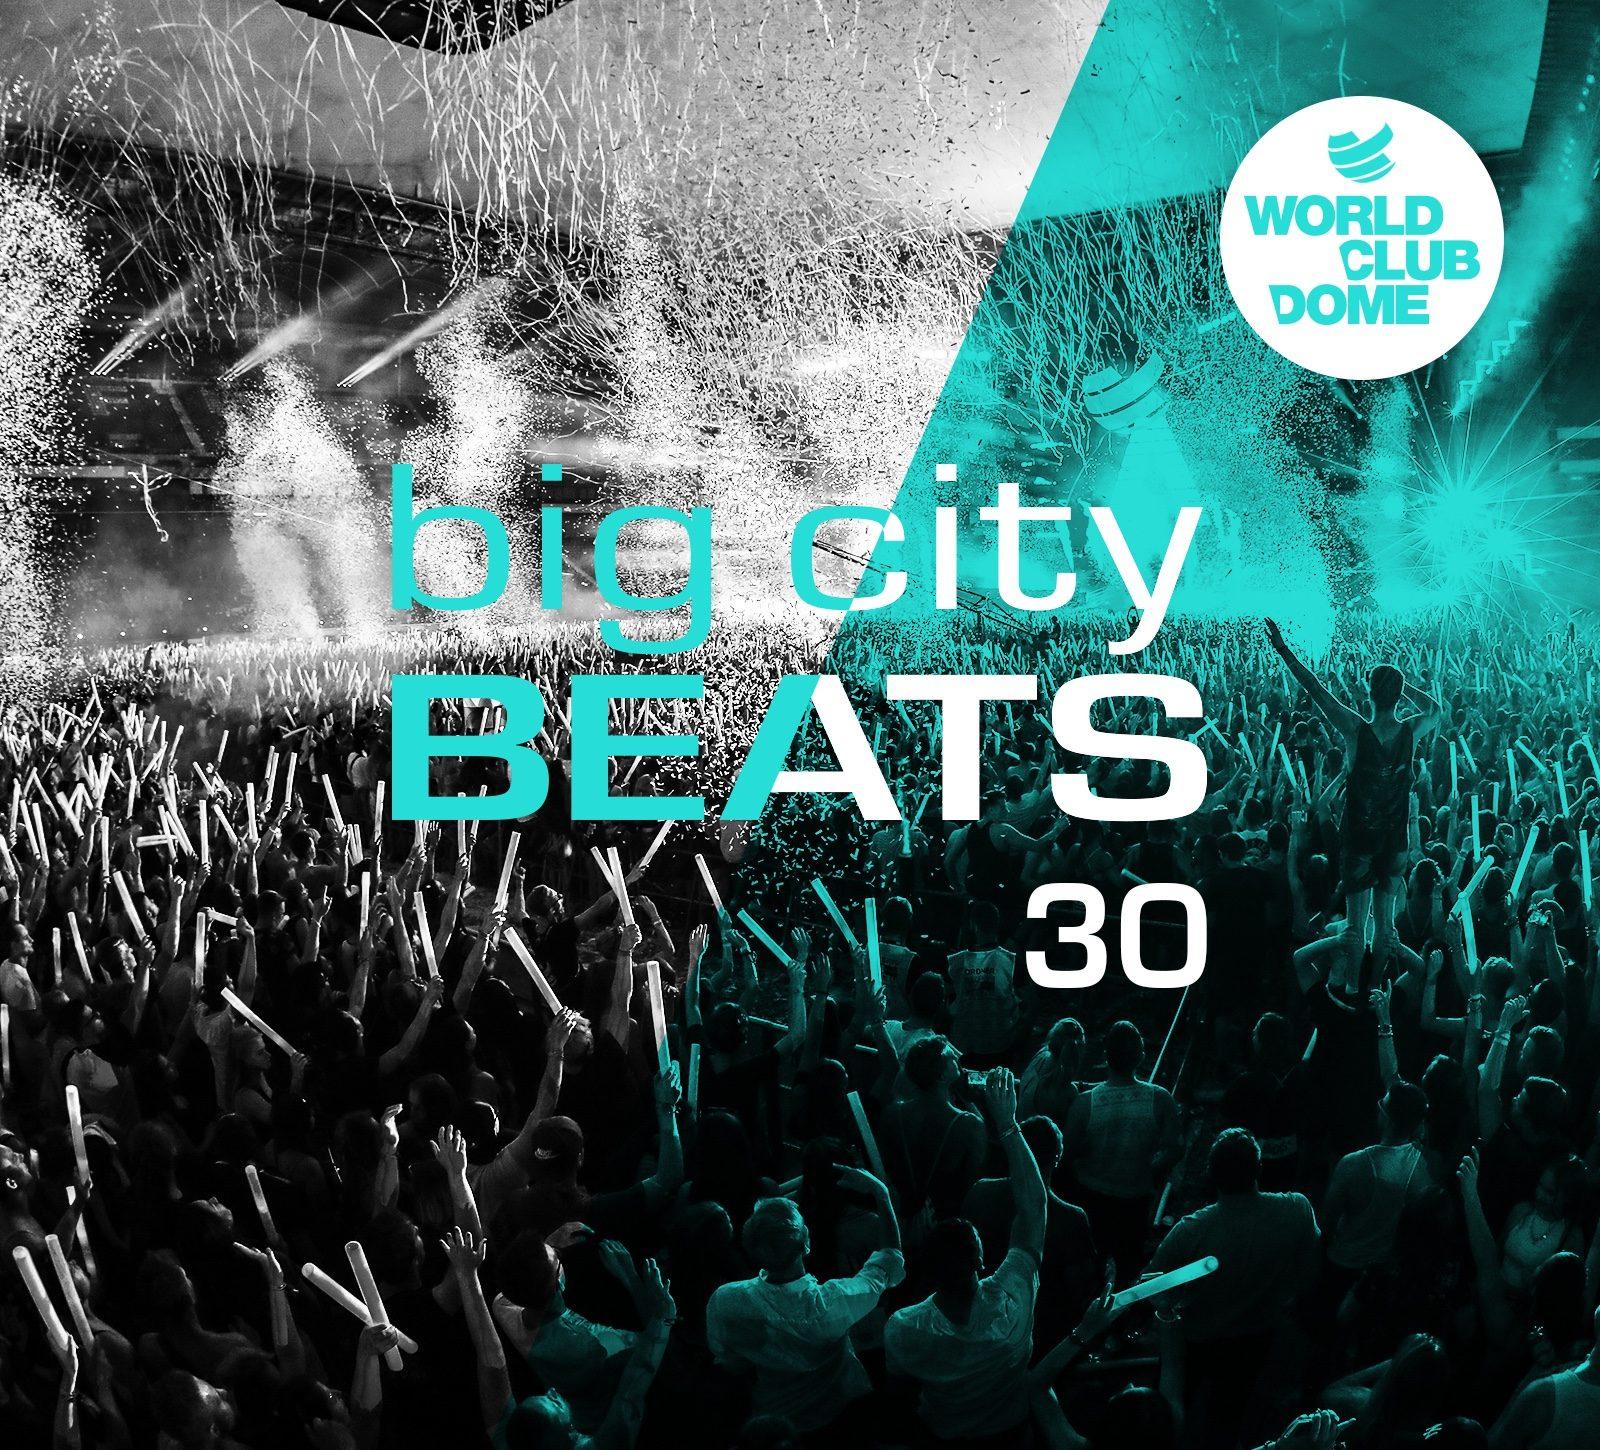 BIG CITY BEATS 30 - WORLD CLUB DOME EDITION